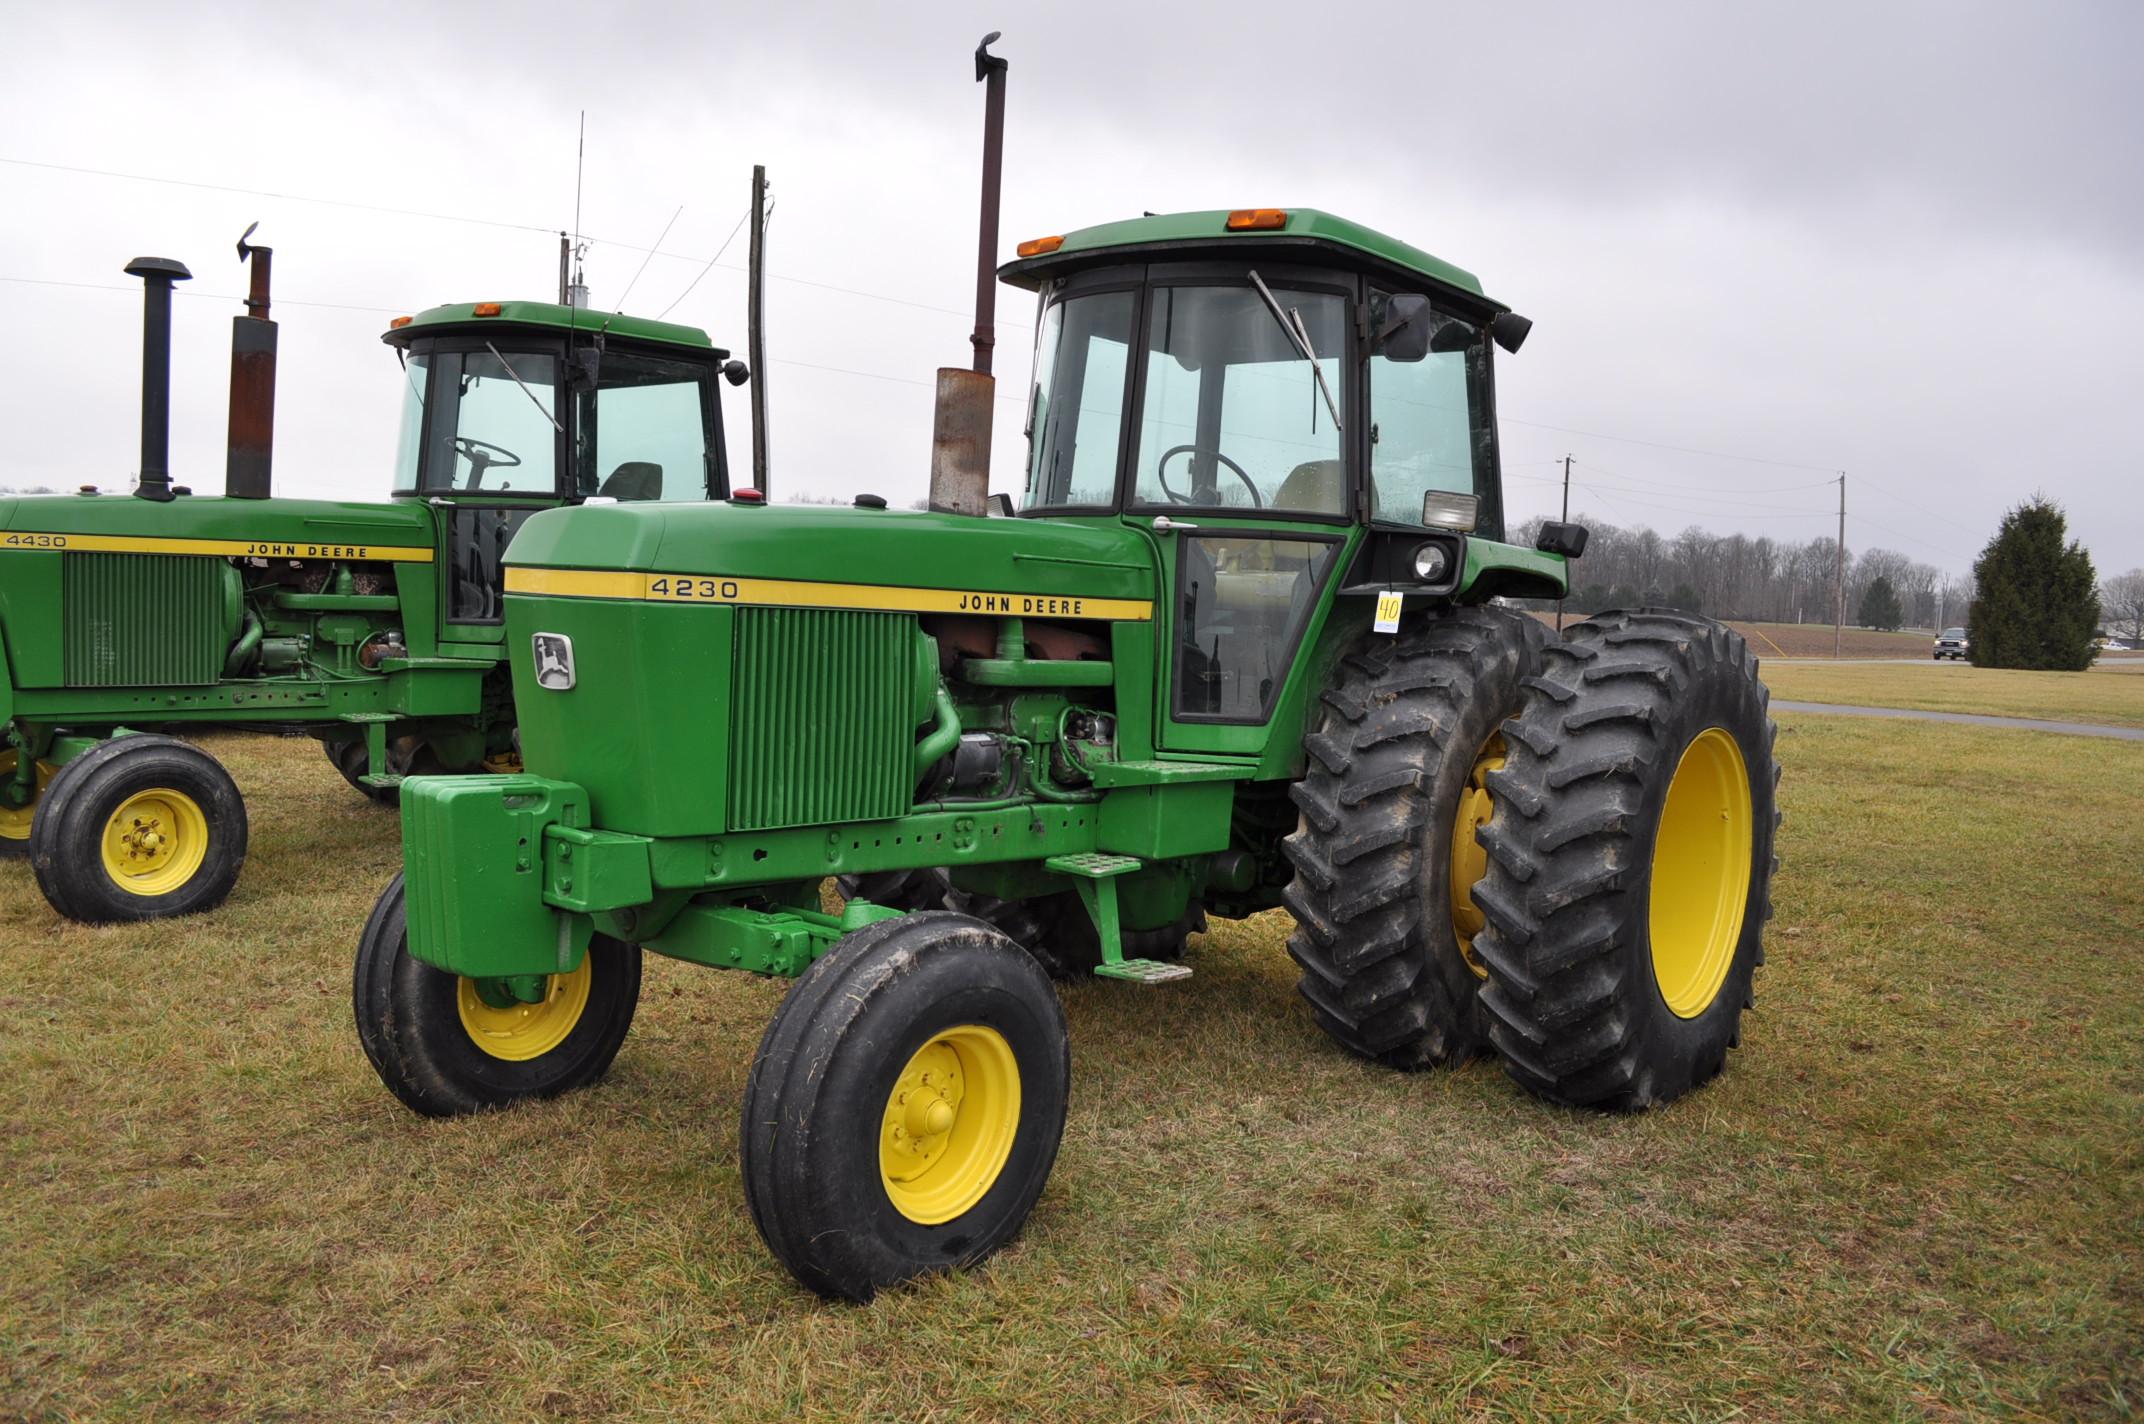 John Deere 4230 tractor, diesel, 18.4-34 hub duals, 10.00-16 front, CHA, Quad range, 2 hyd